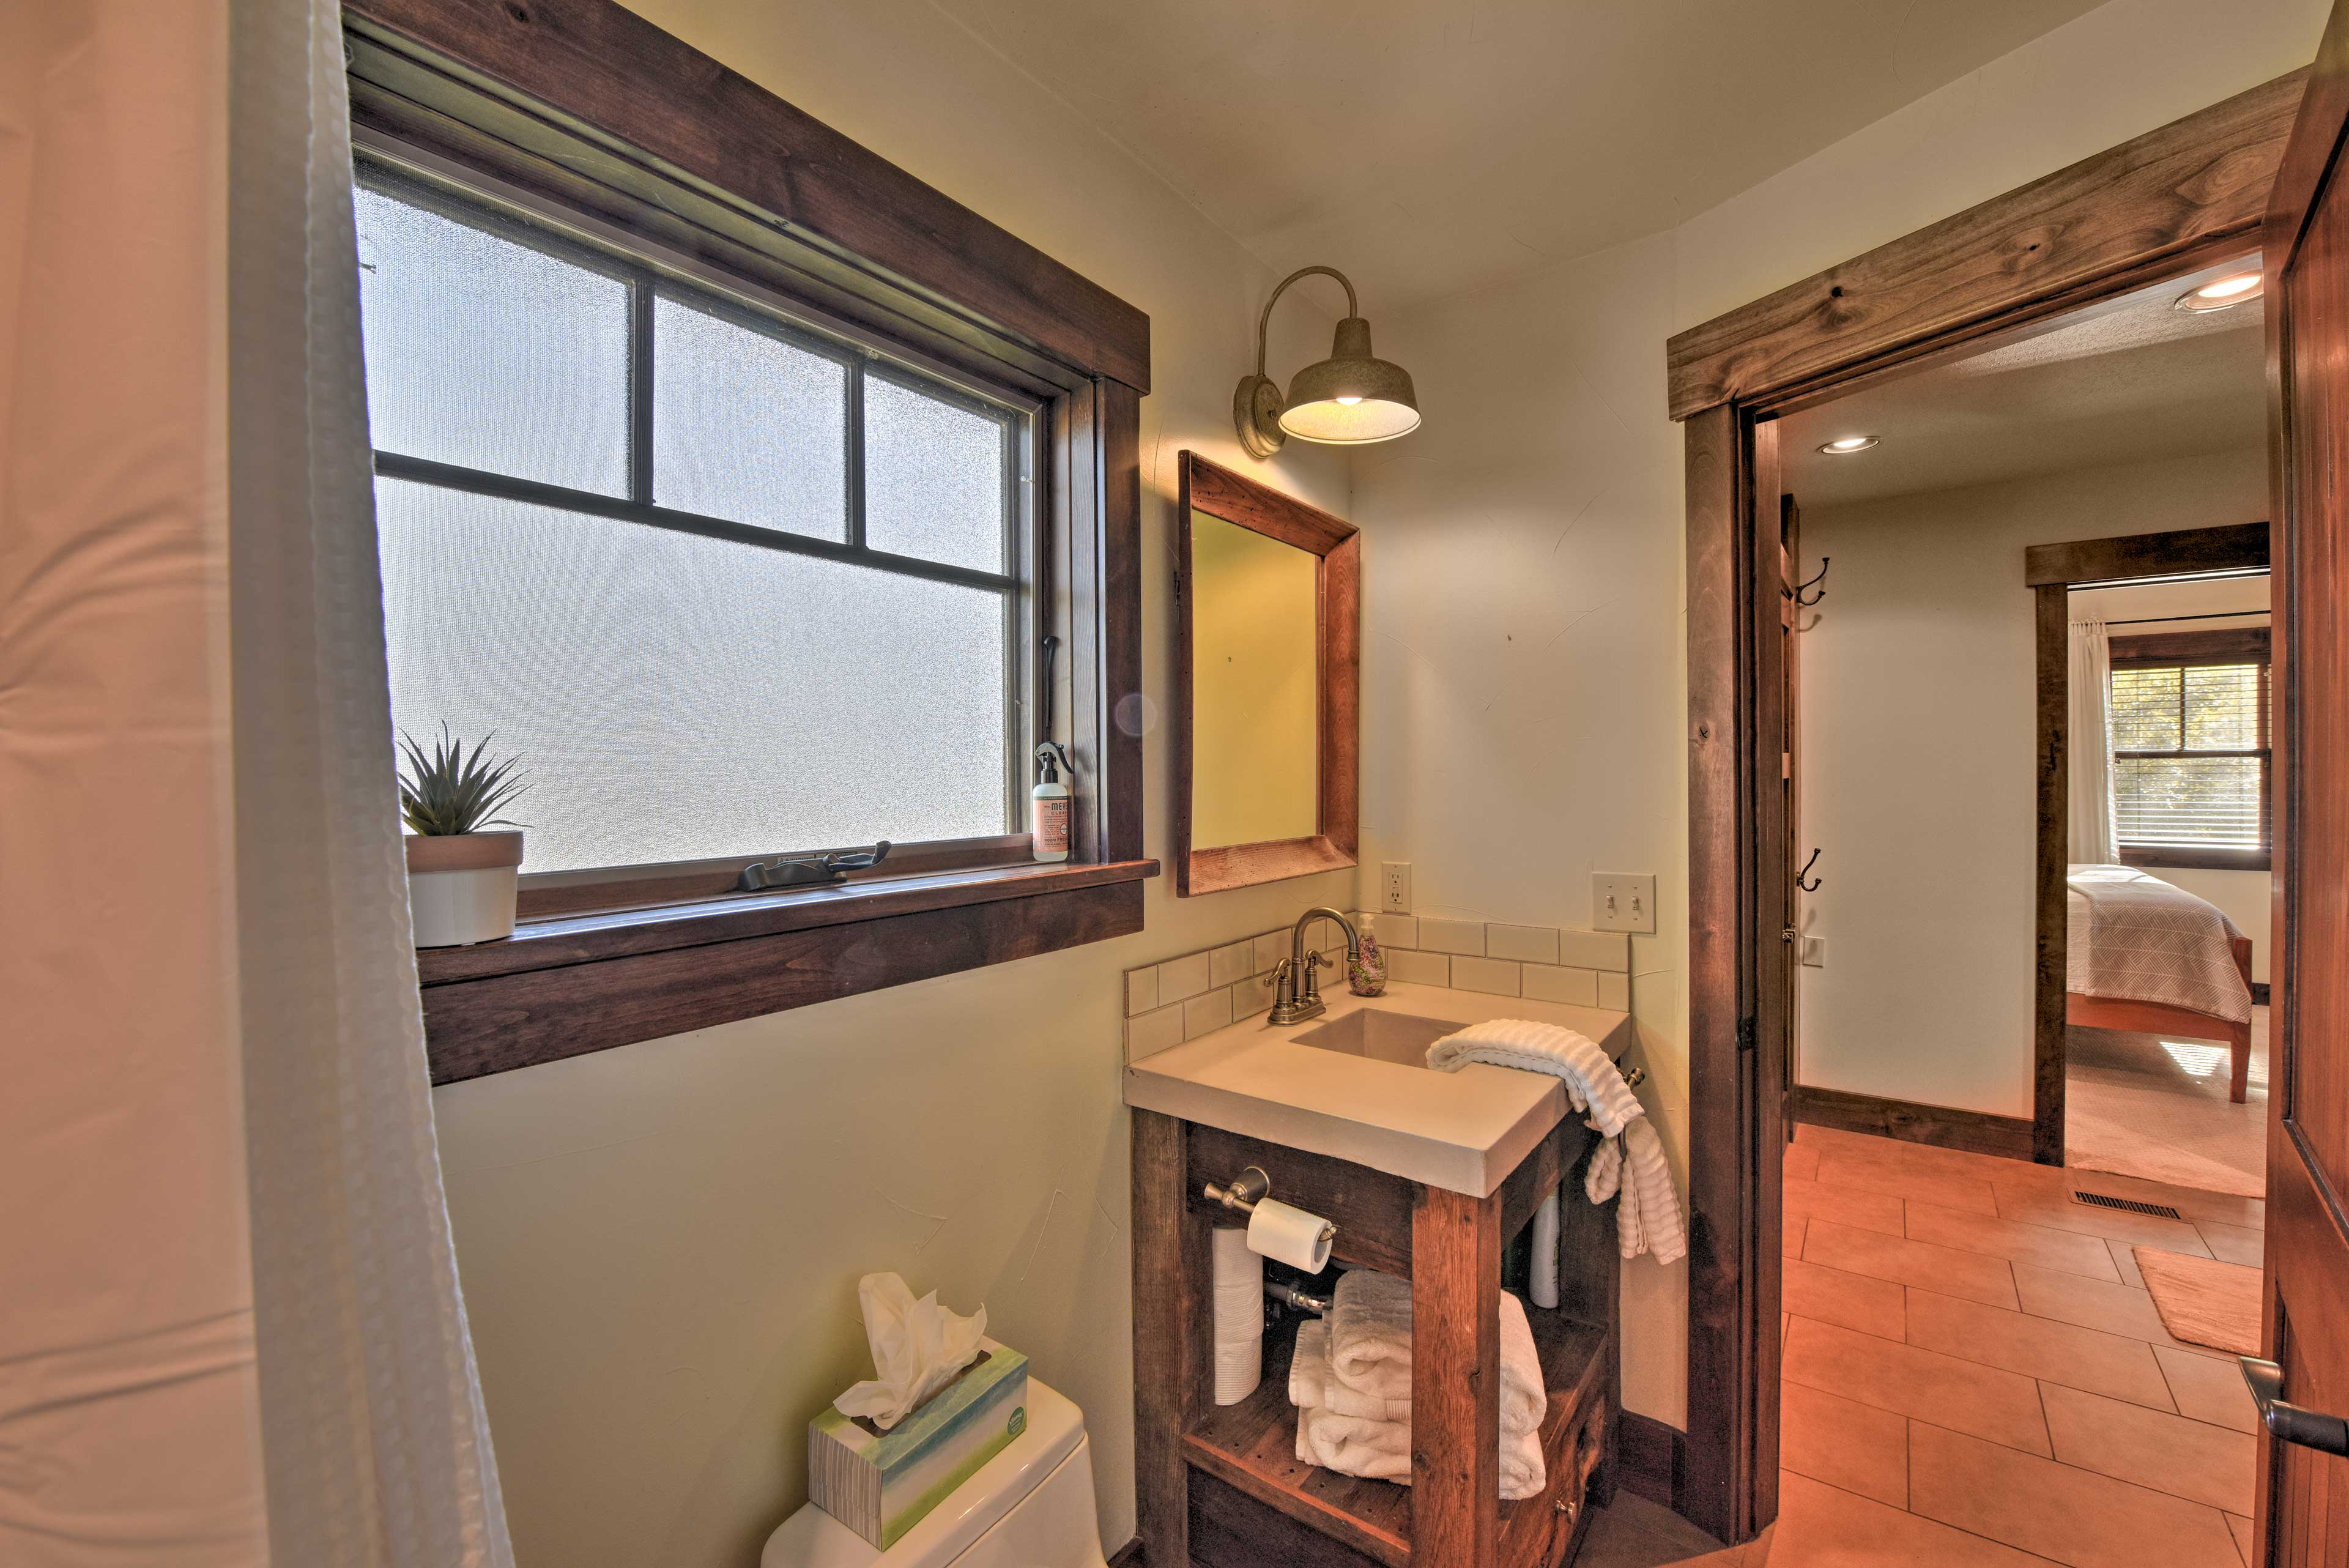 First Full Bathroom | Complimentary Toiletries